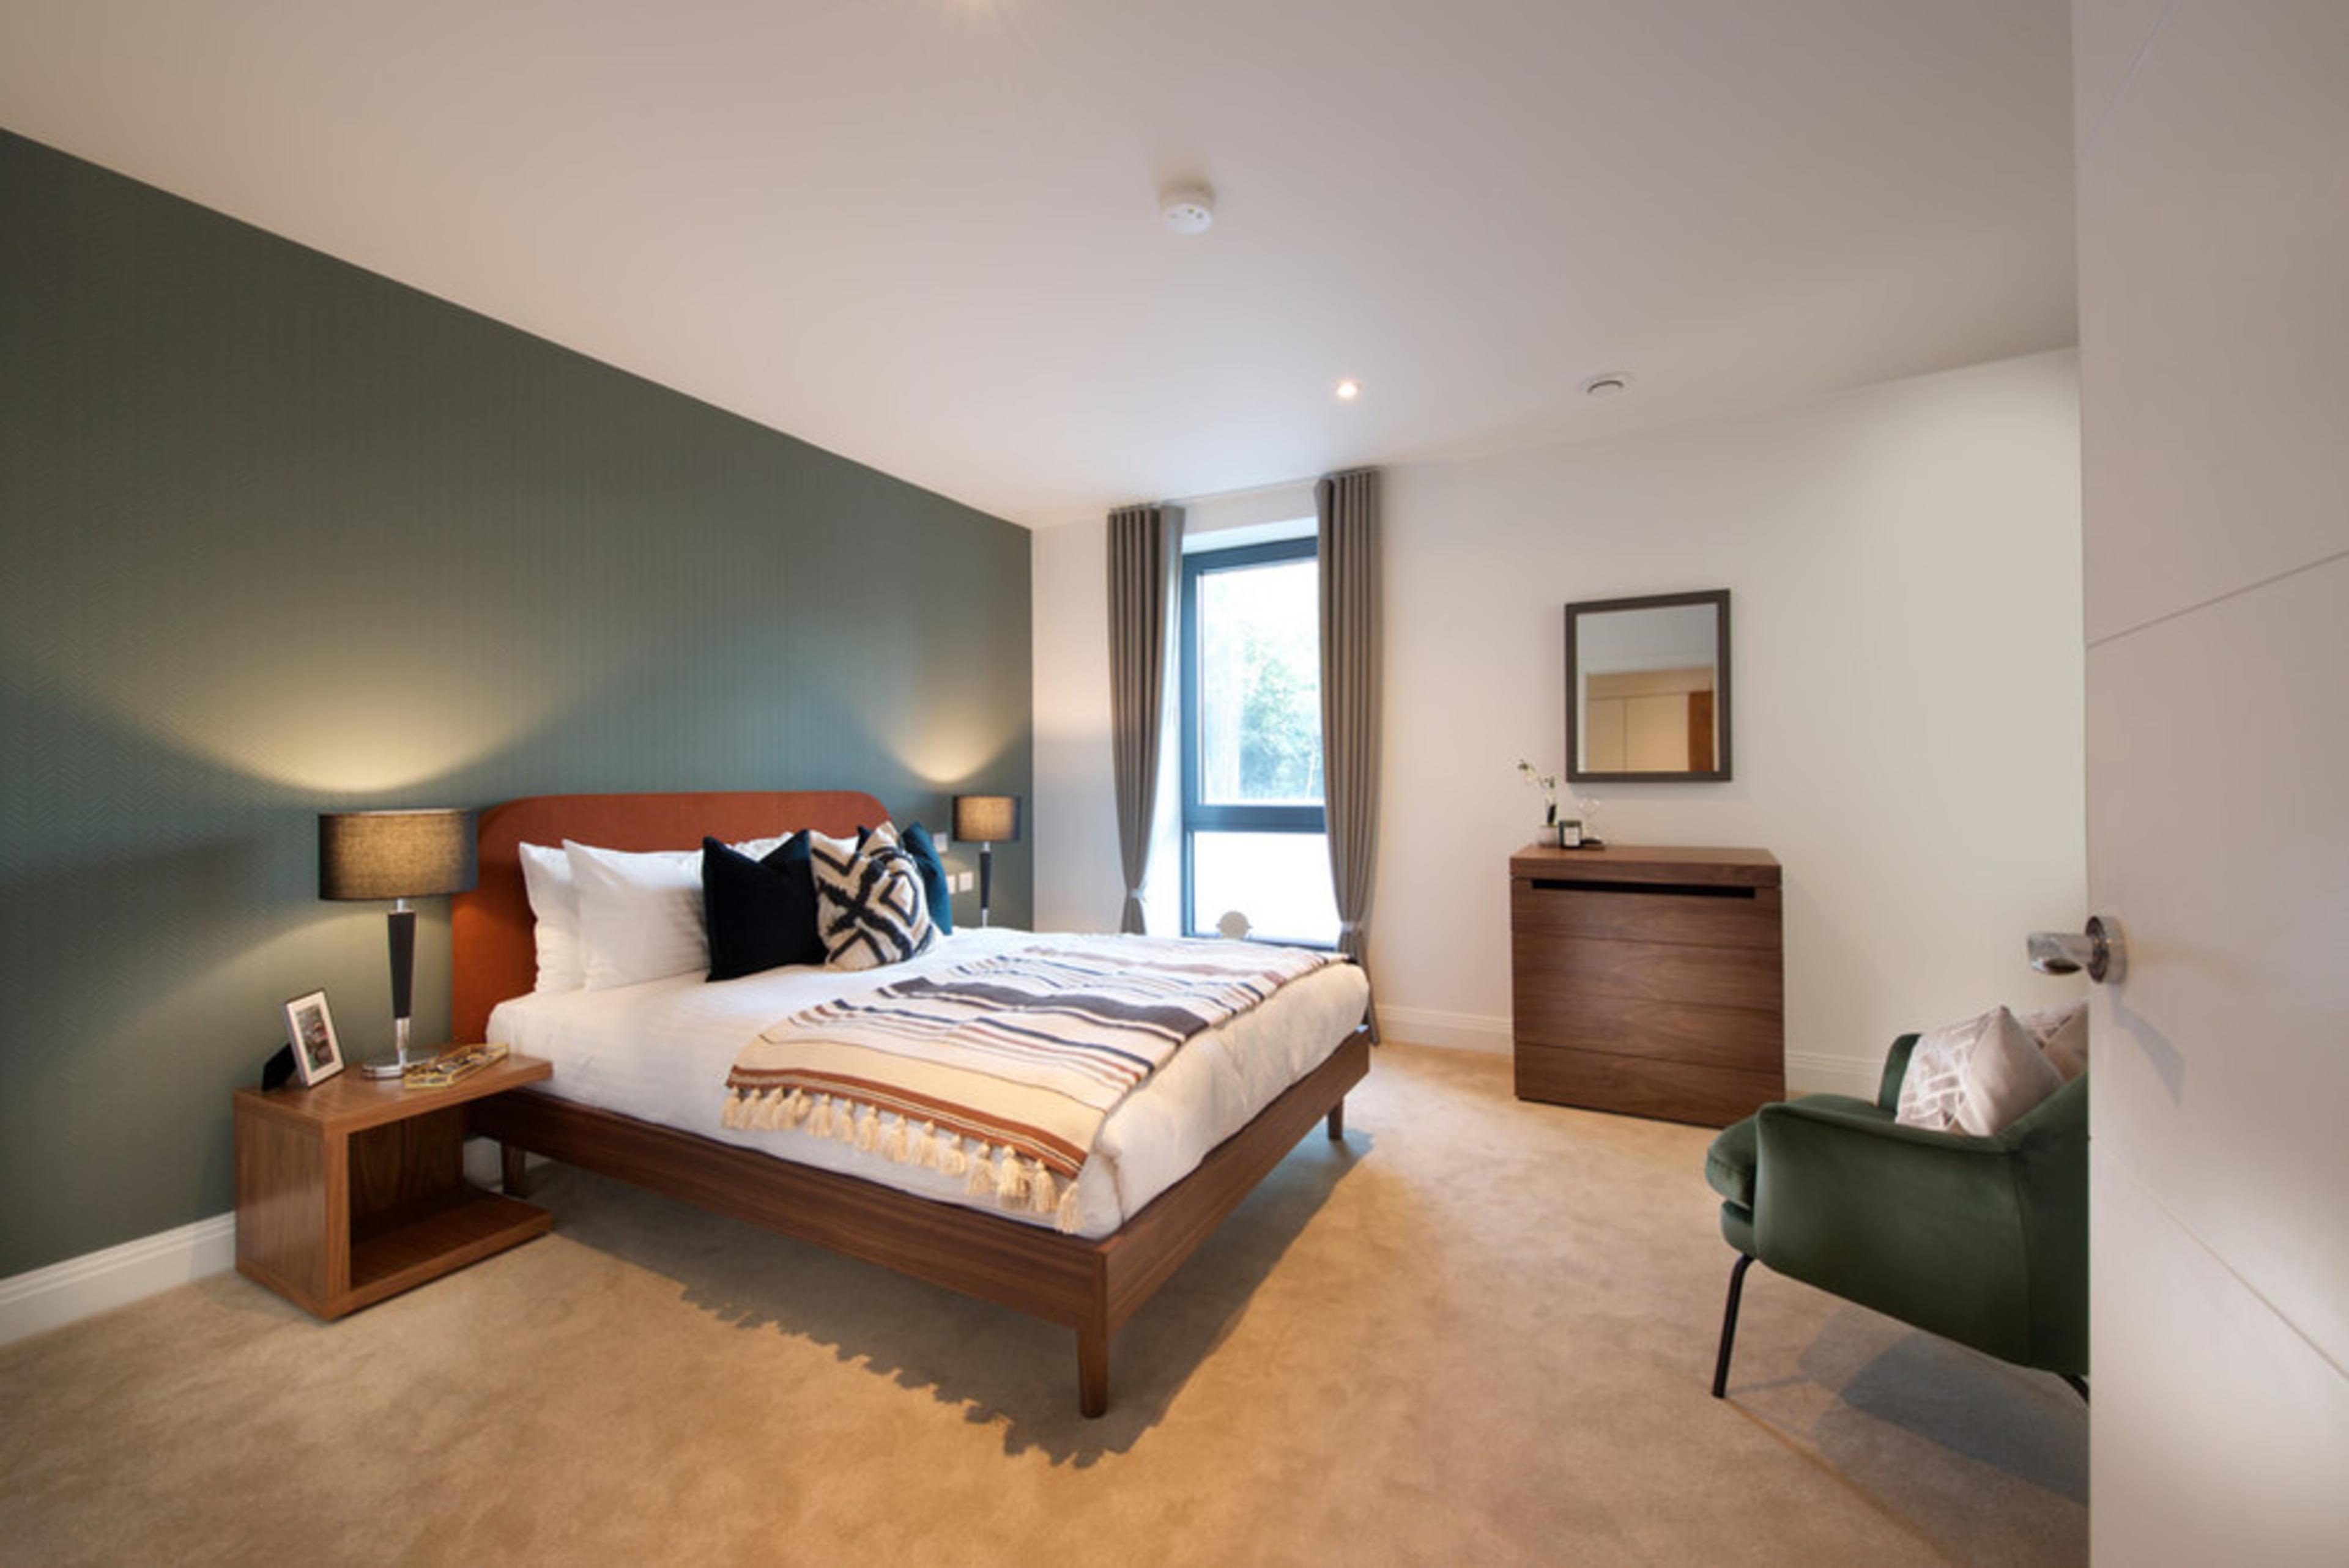 Union Park - Master bedroom